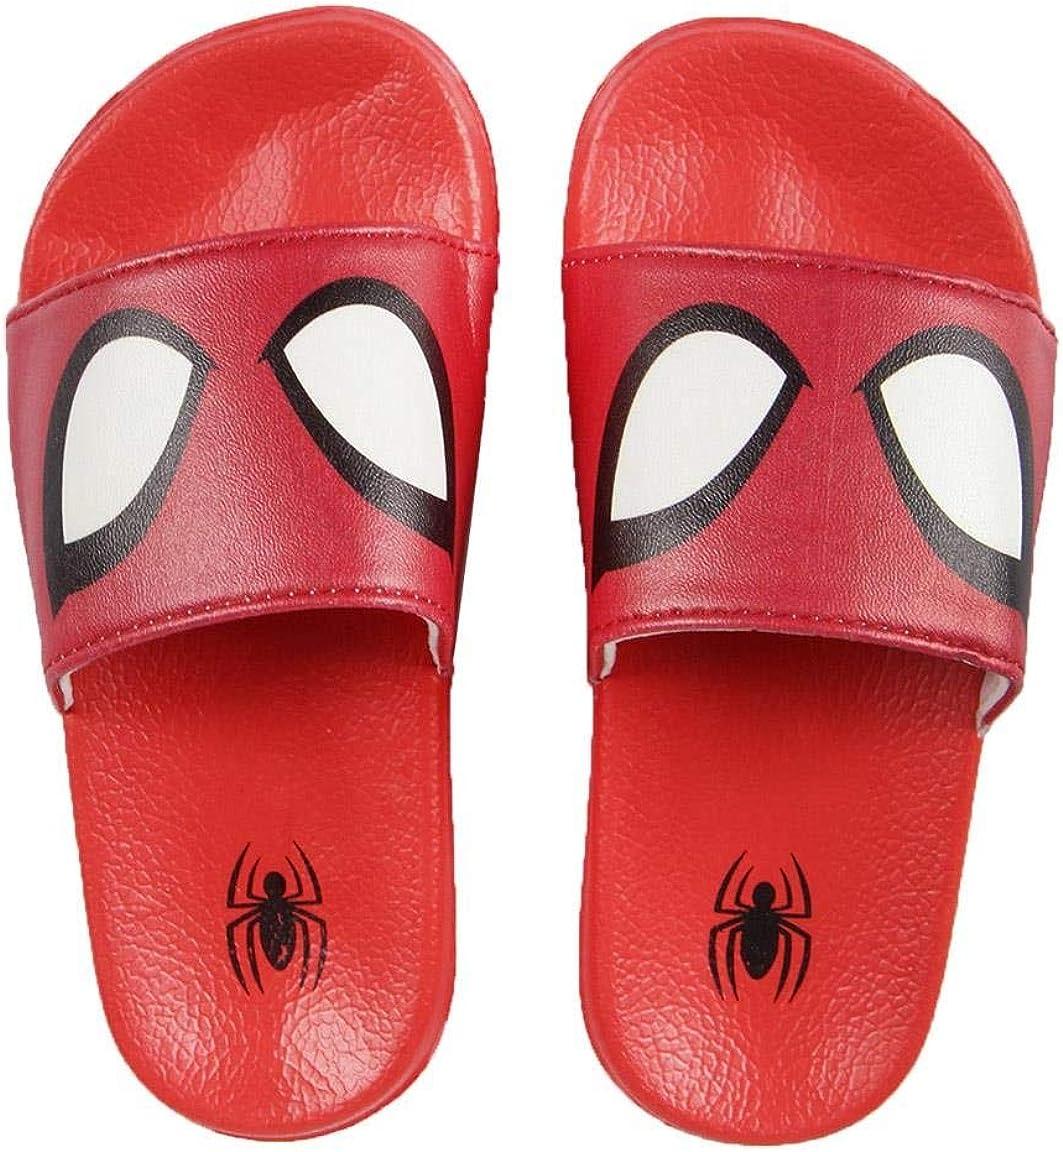 31 EU Multicolore Flip Flop Mixte Enfant Spiderman S0717671